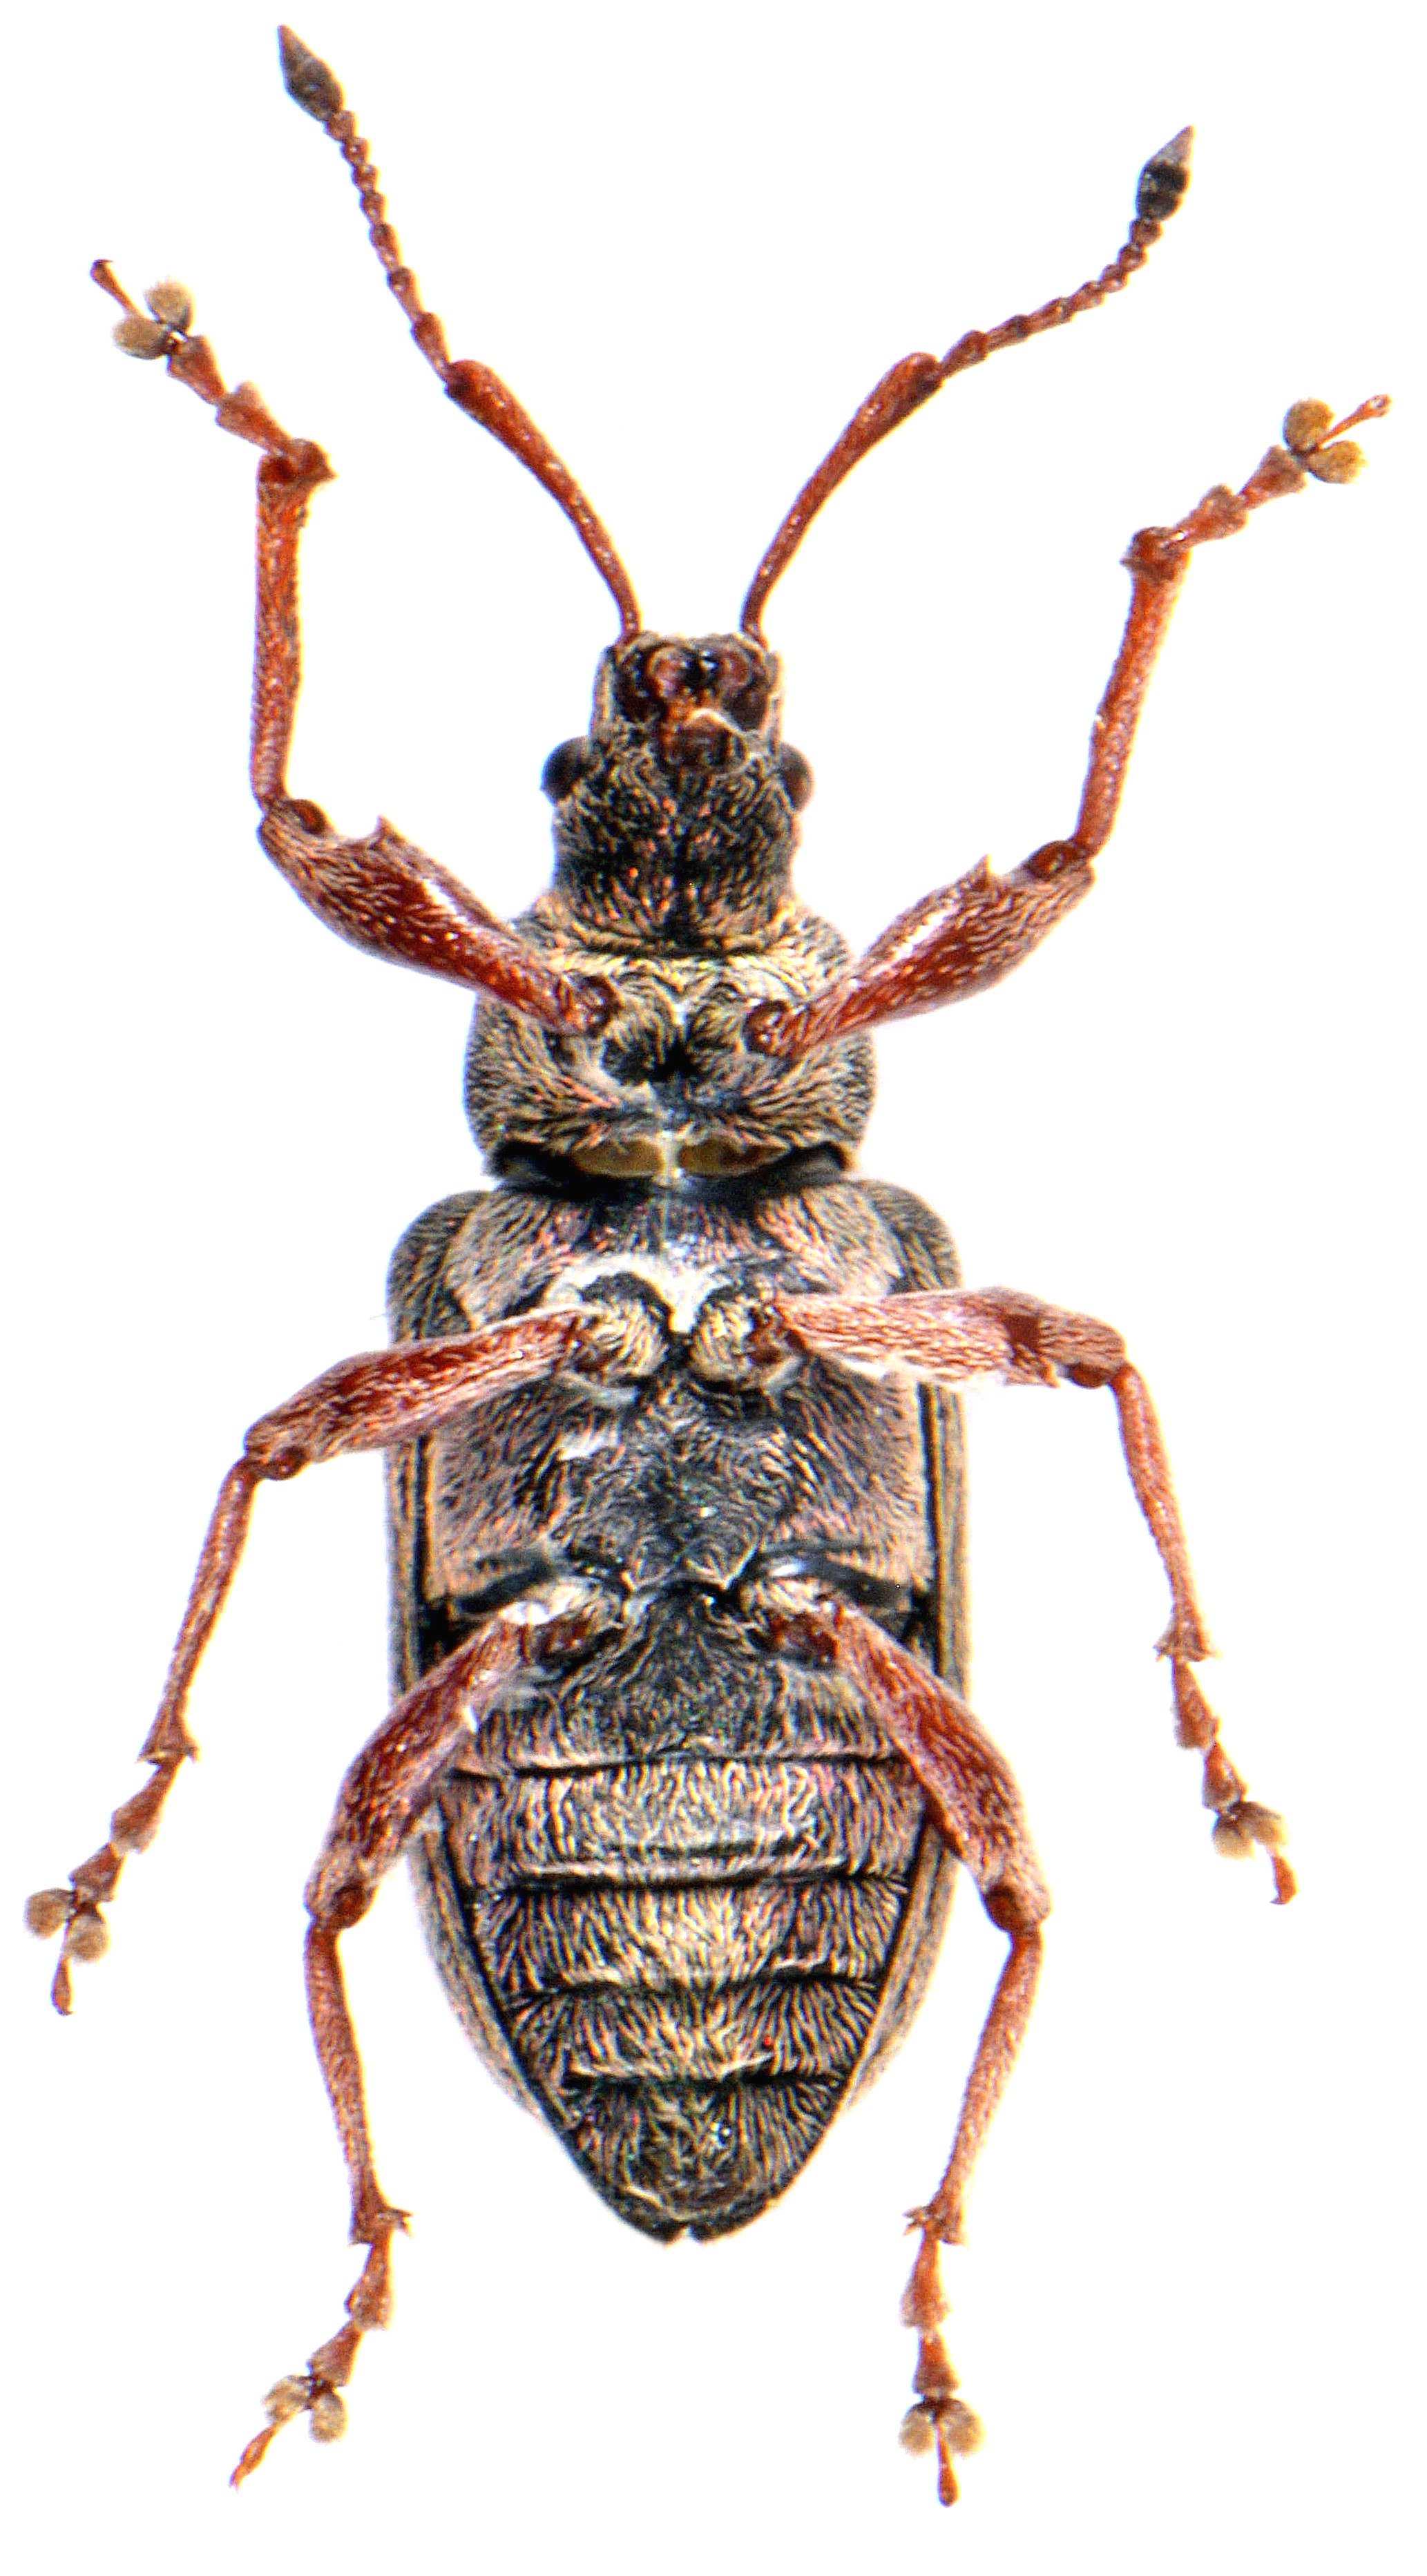 Phyllobius pyri